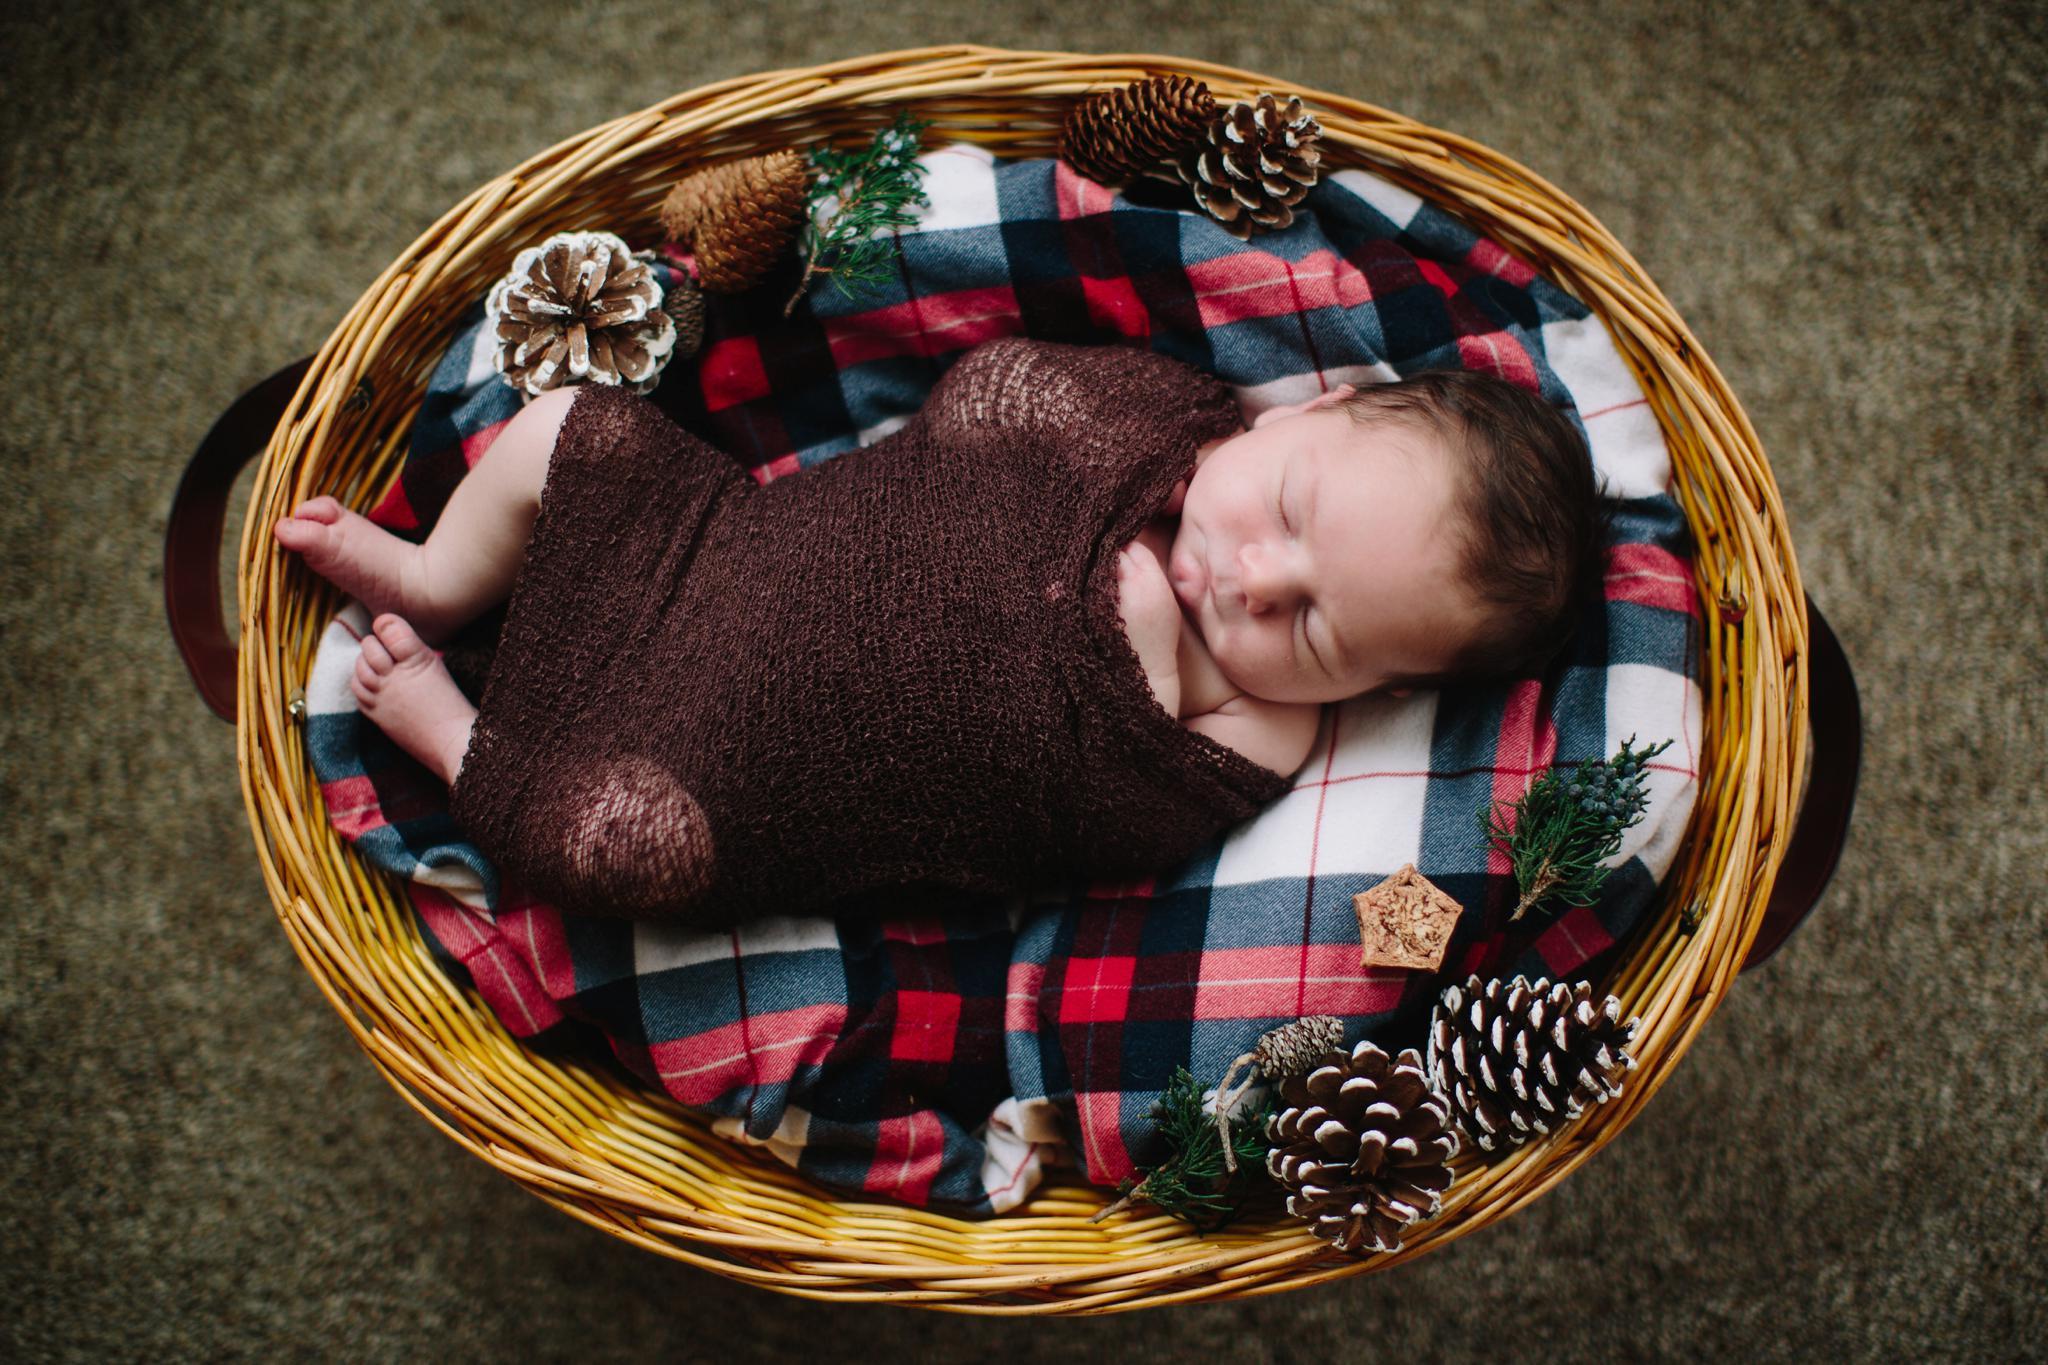 tunkhannock_newborn_photographer_4351.jpg